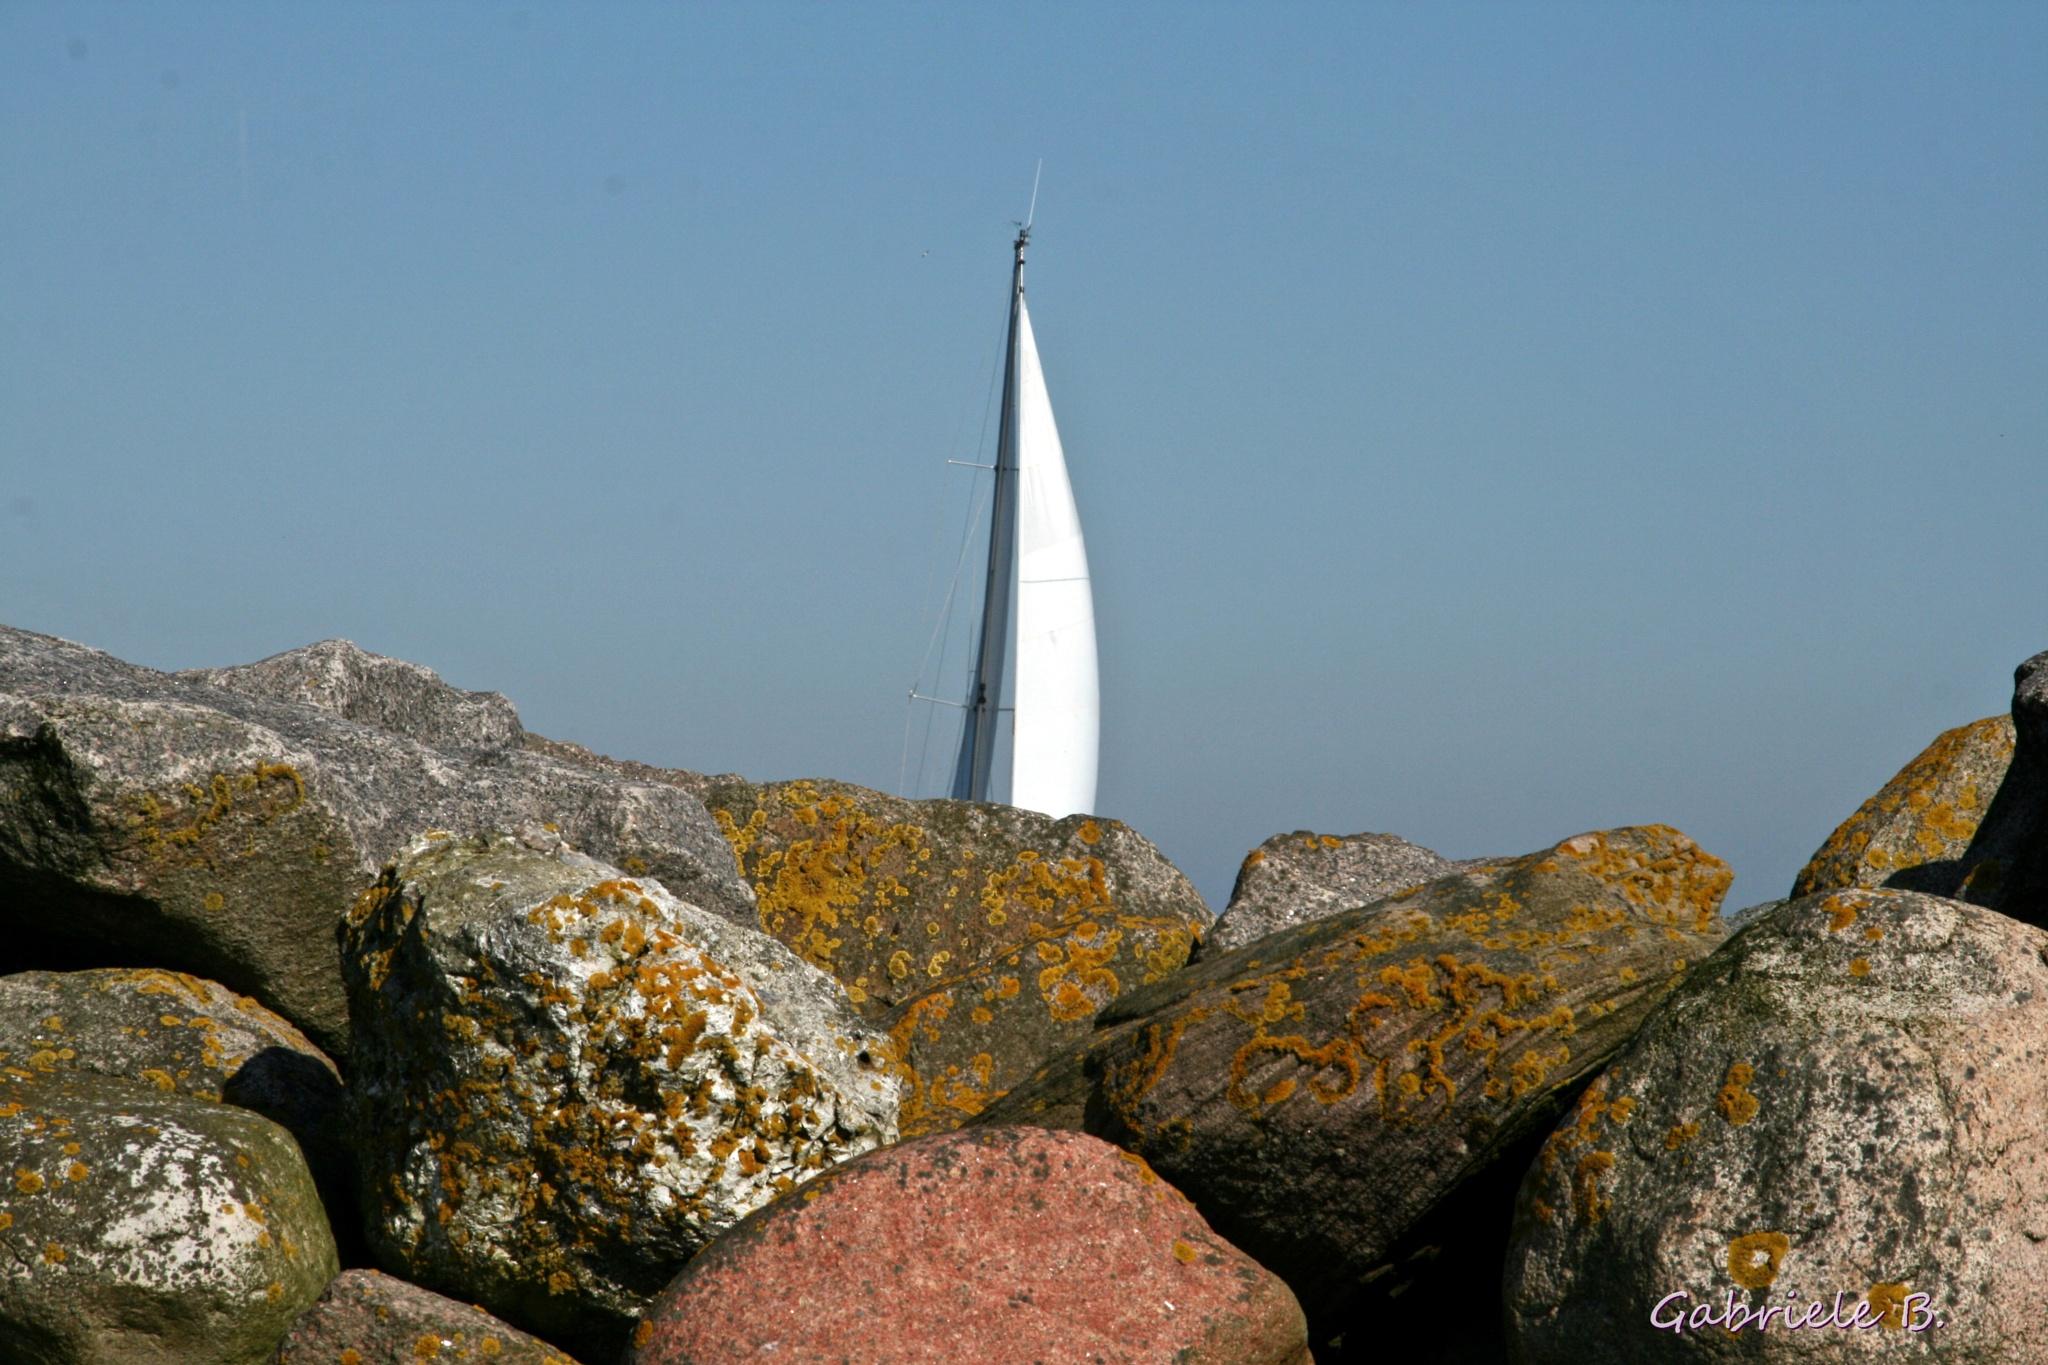 Sail behind the rocks by gabrielehelenebittner